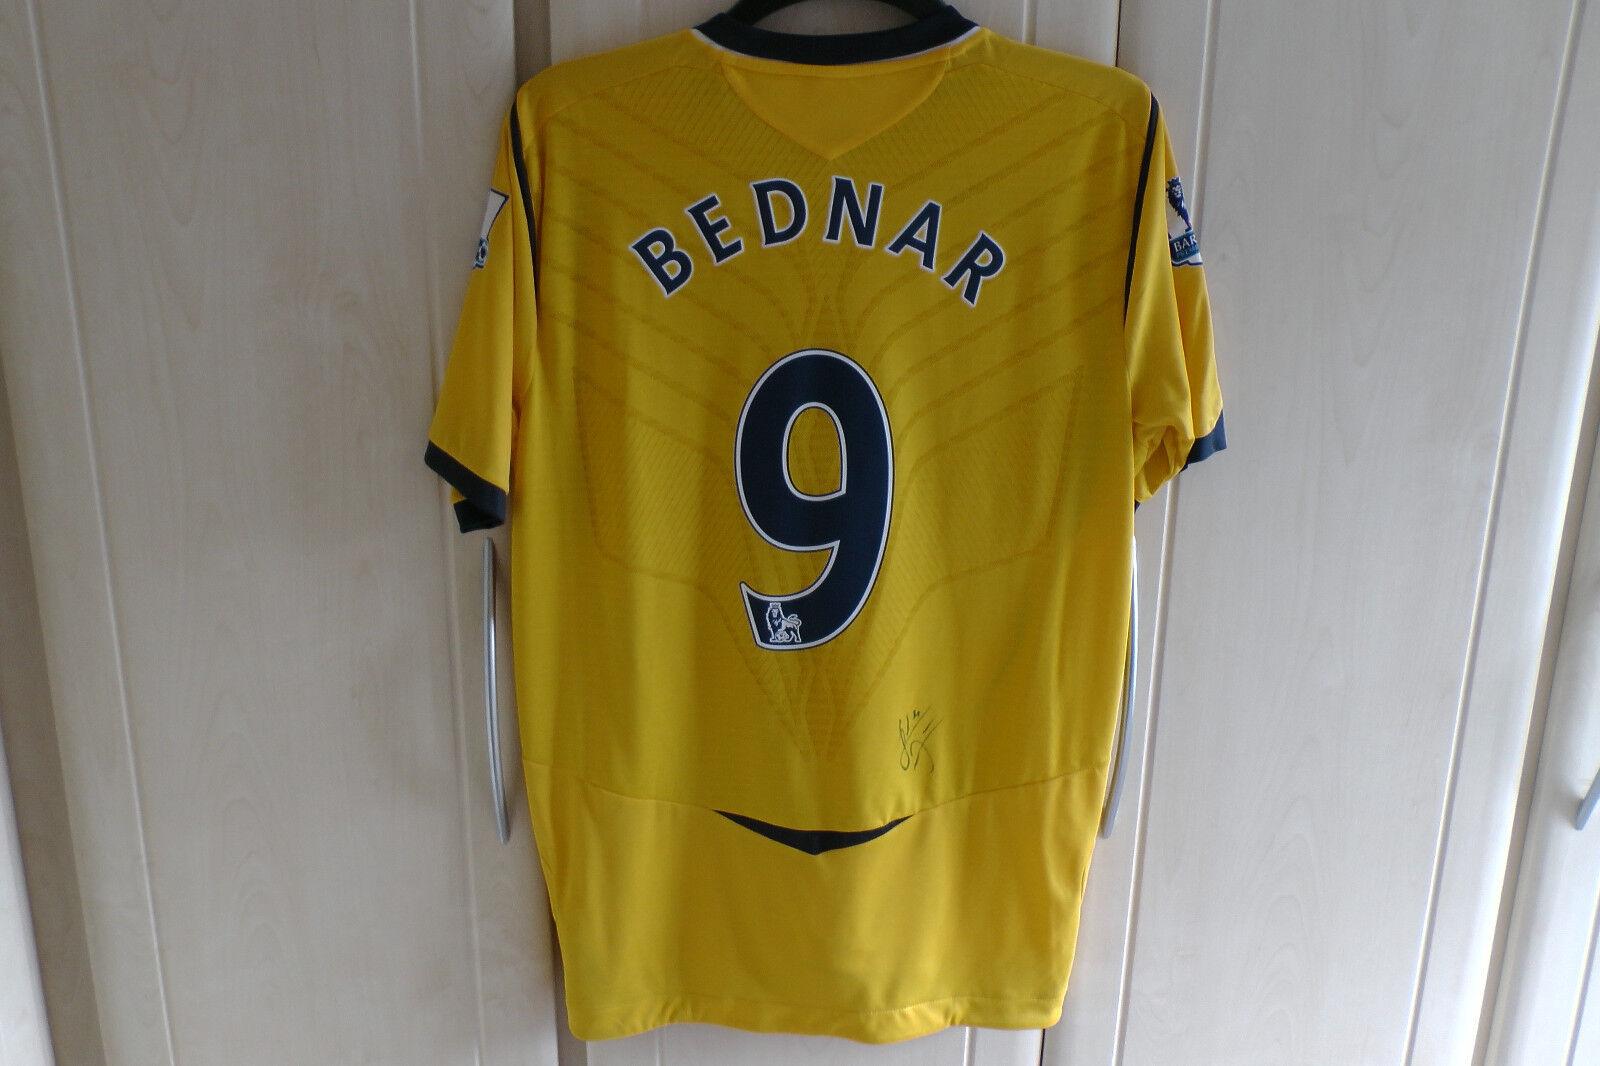 West Bromwich Albion WBA 2008 2009 Roman Bednar signed shirt Marek Cech grandes